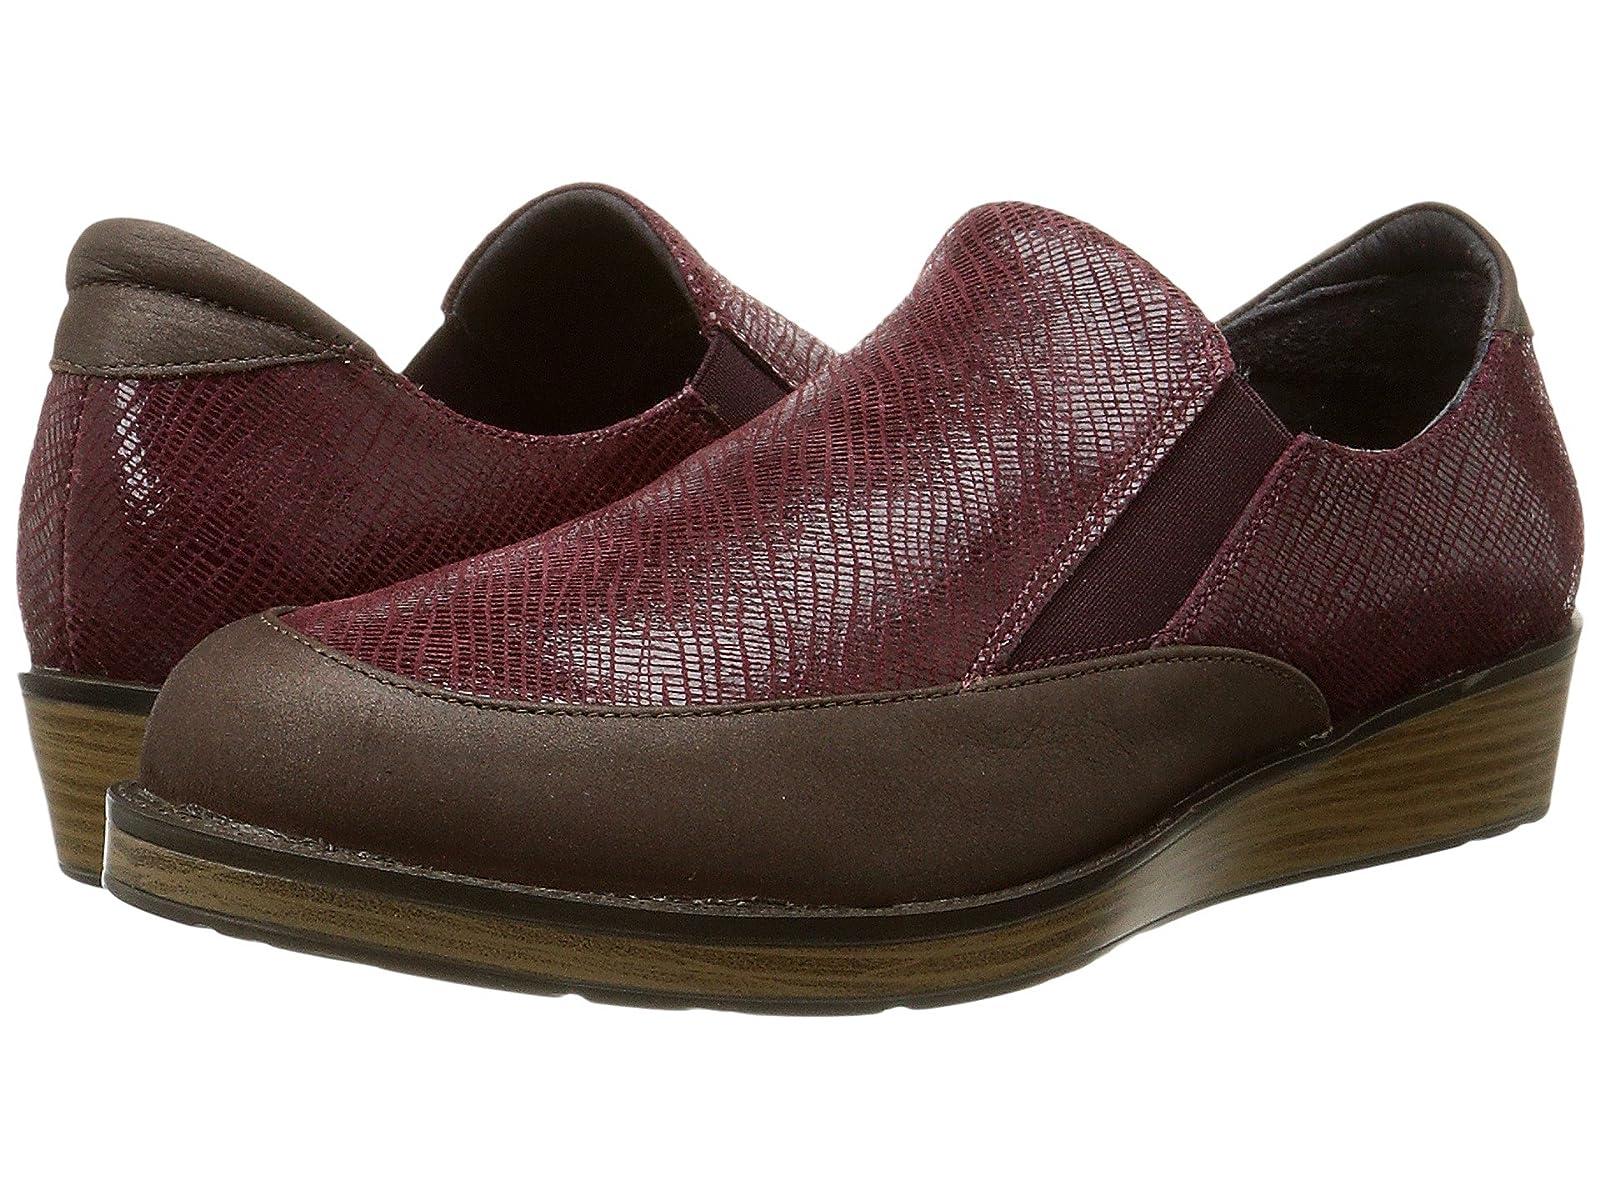 Naot CherishCheap and distinctive eye-catching shoes